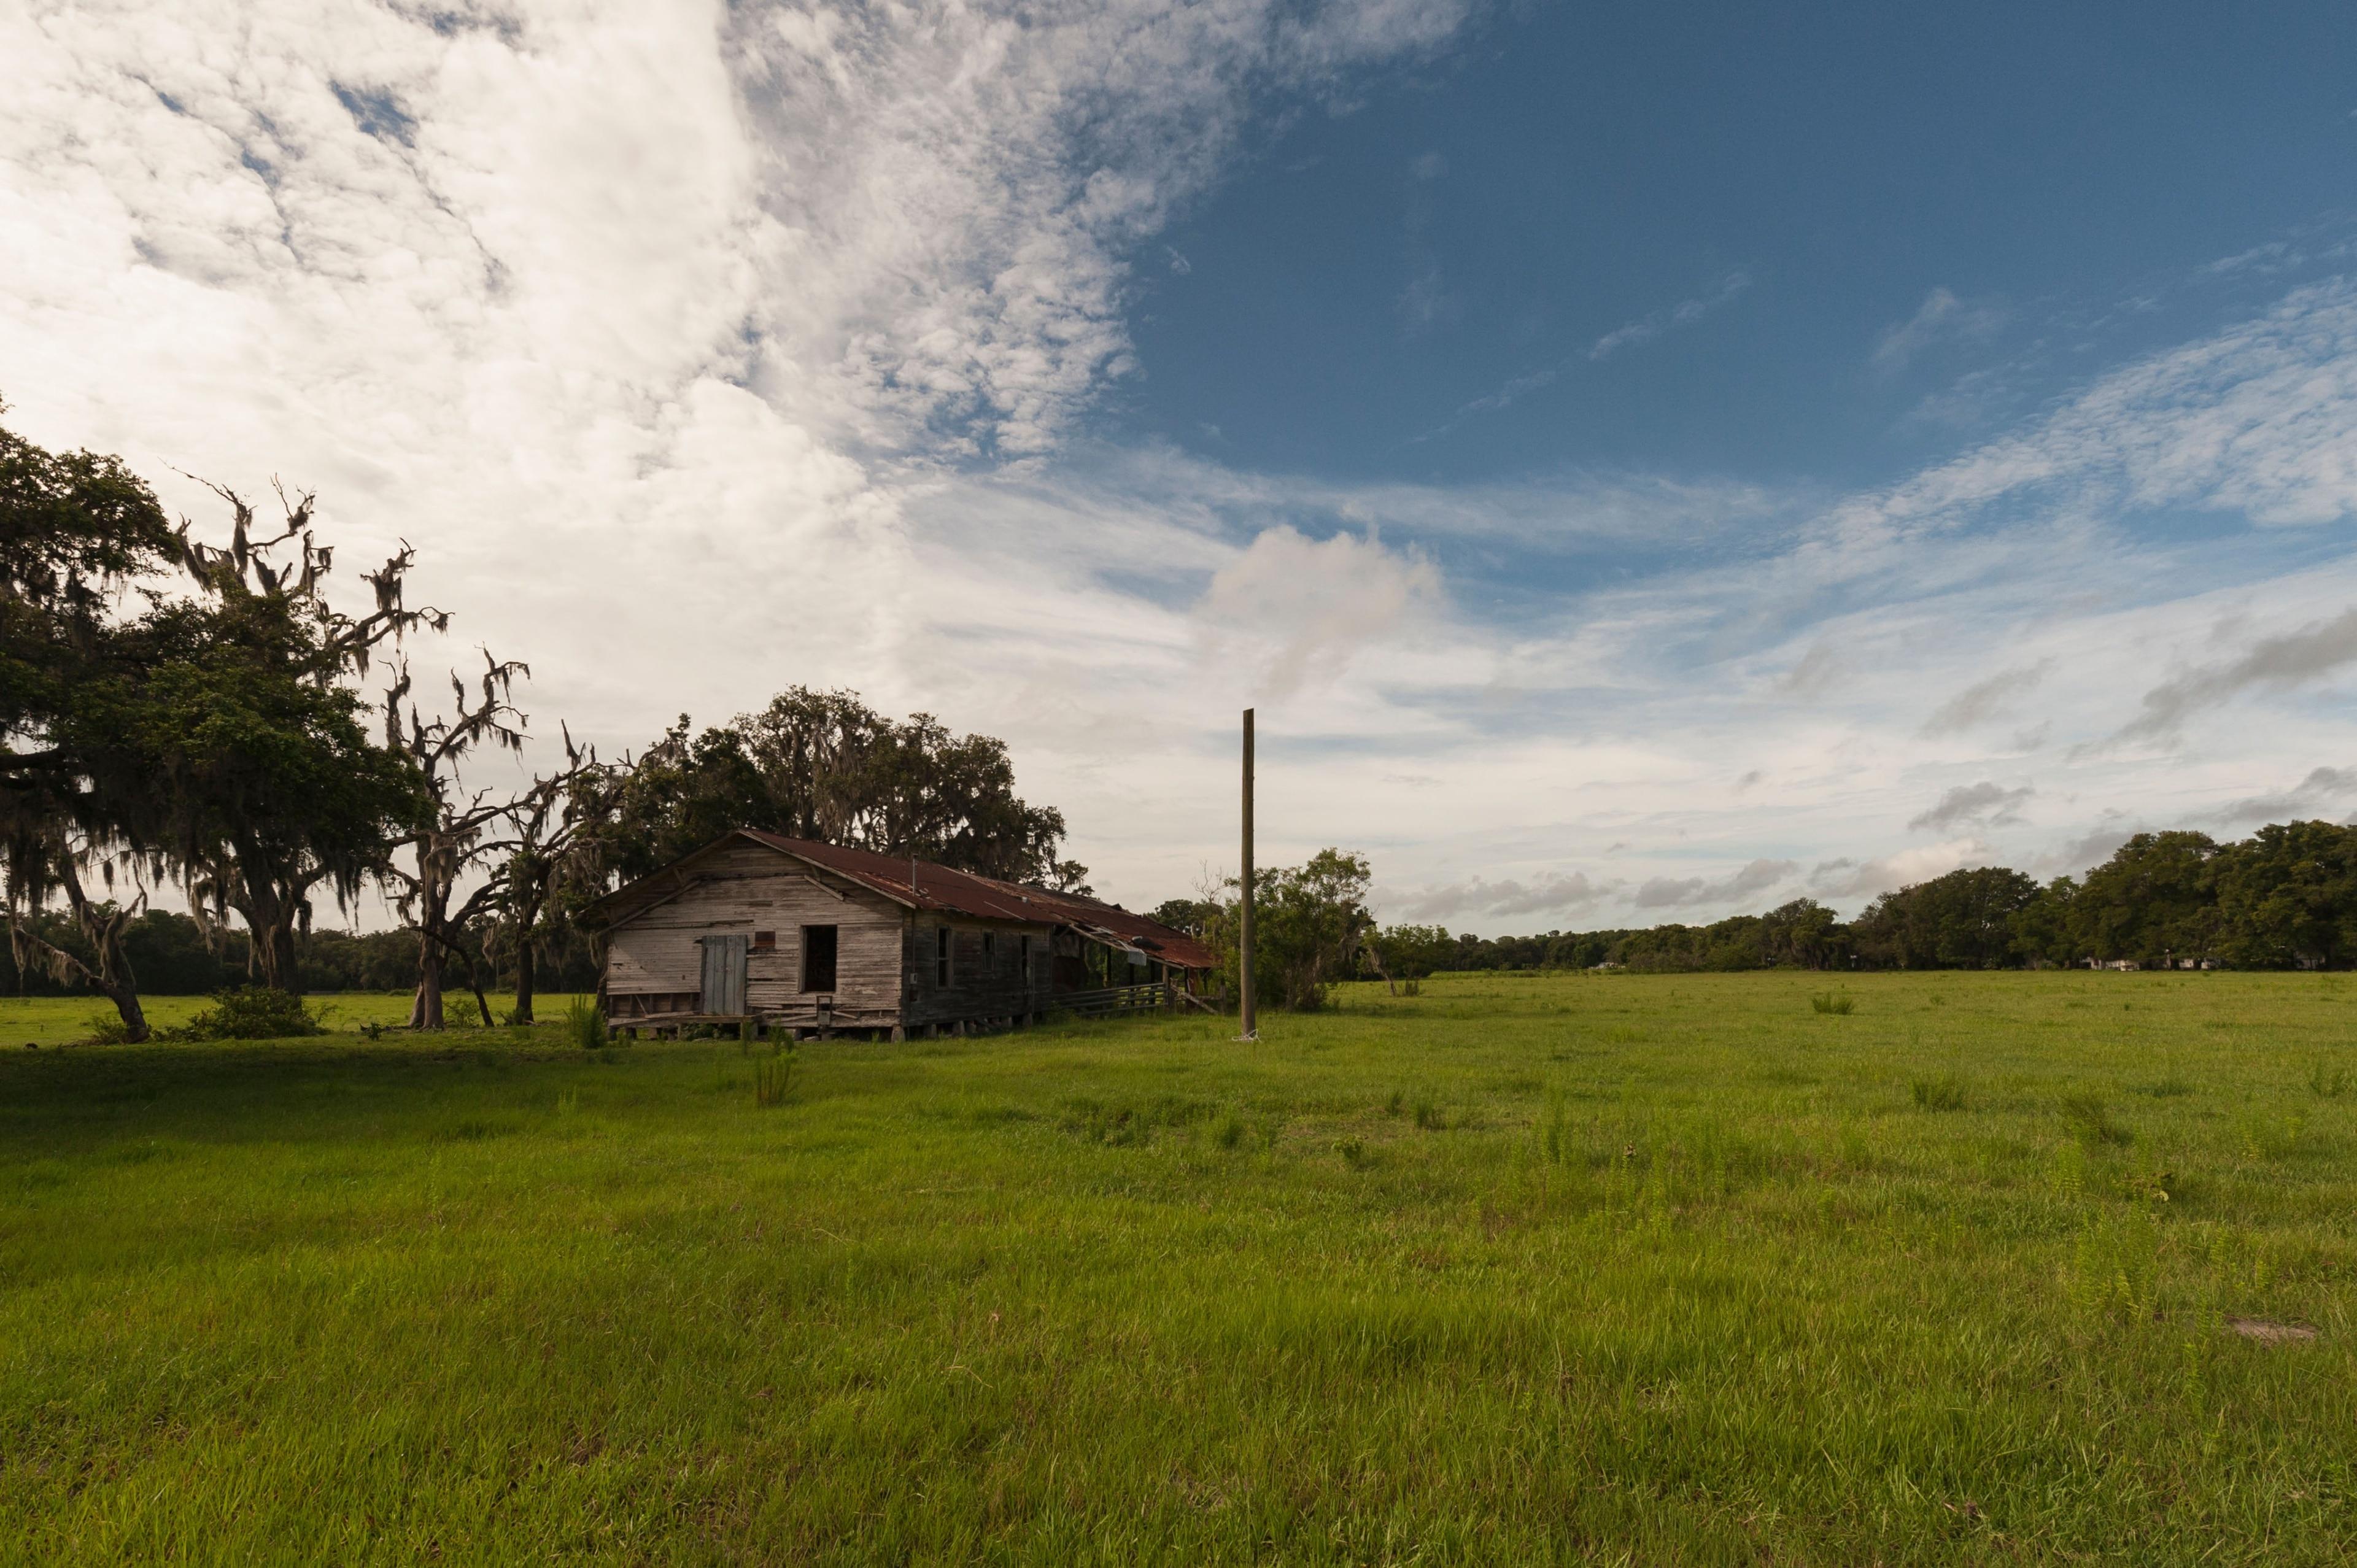 Wildwood, Florida, United States of America